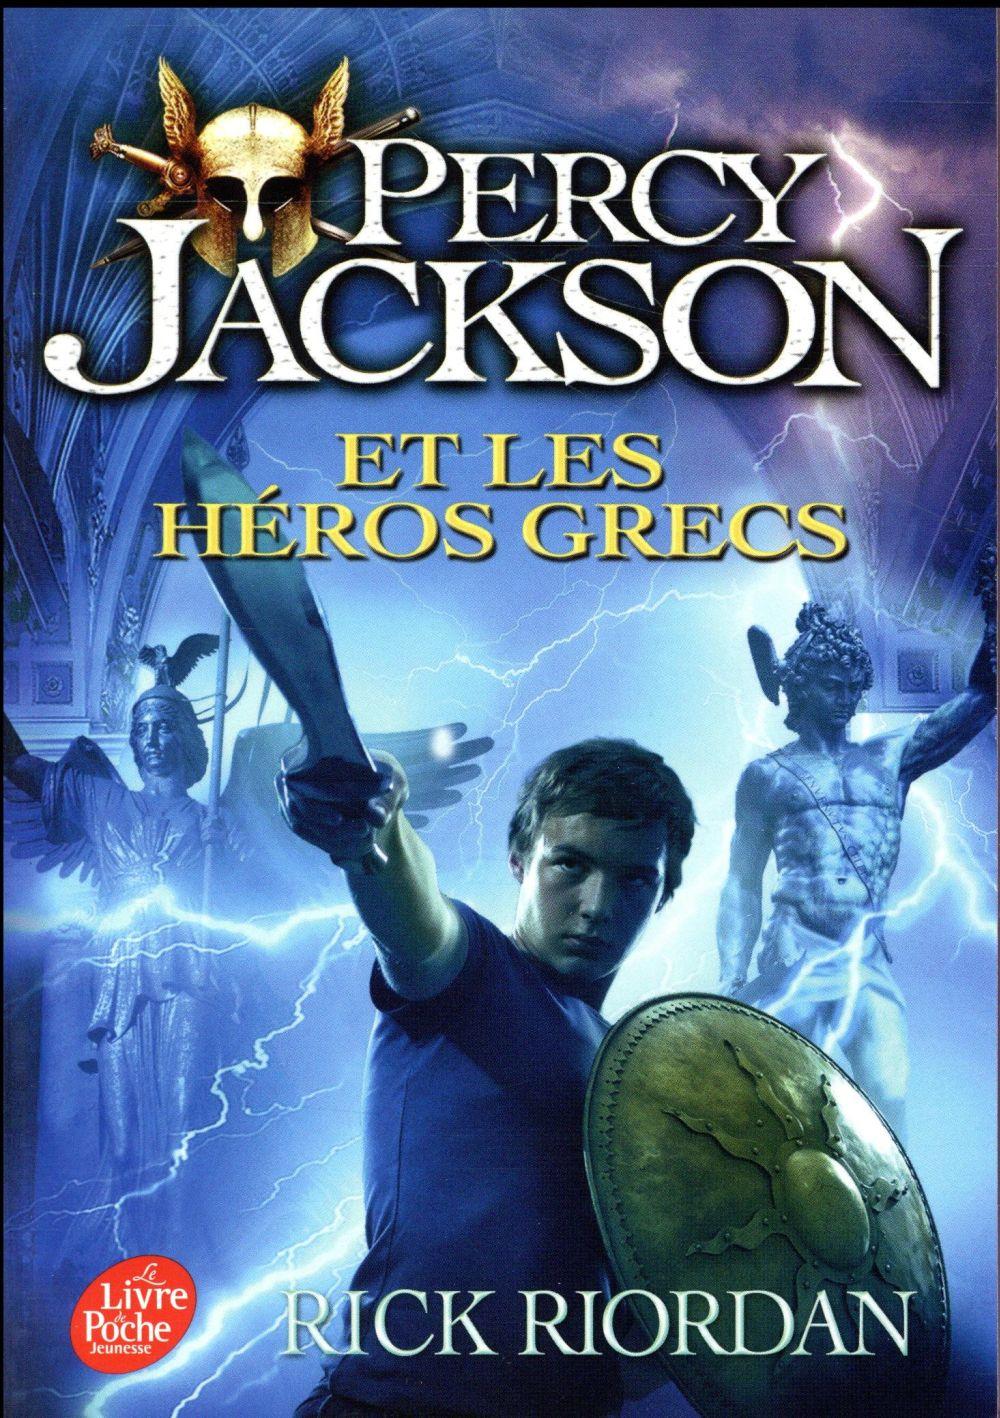 PERCY JACKSON ET LES HEROS GRECS - TOME 7